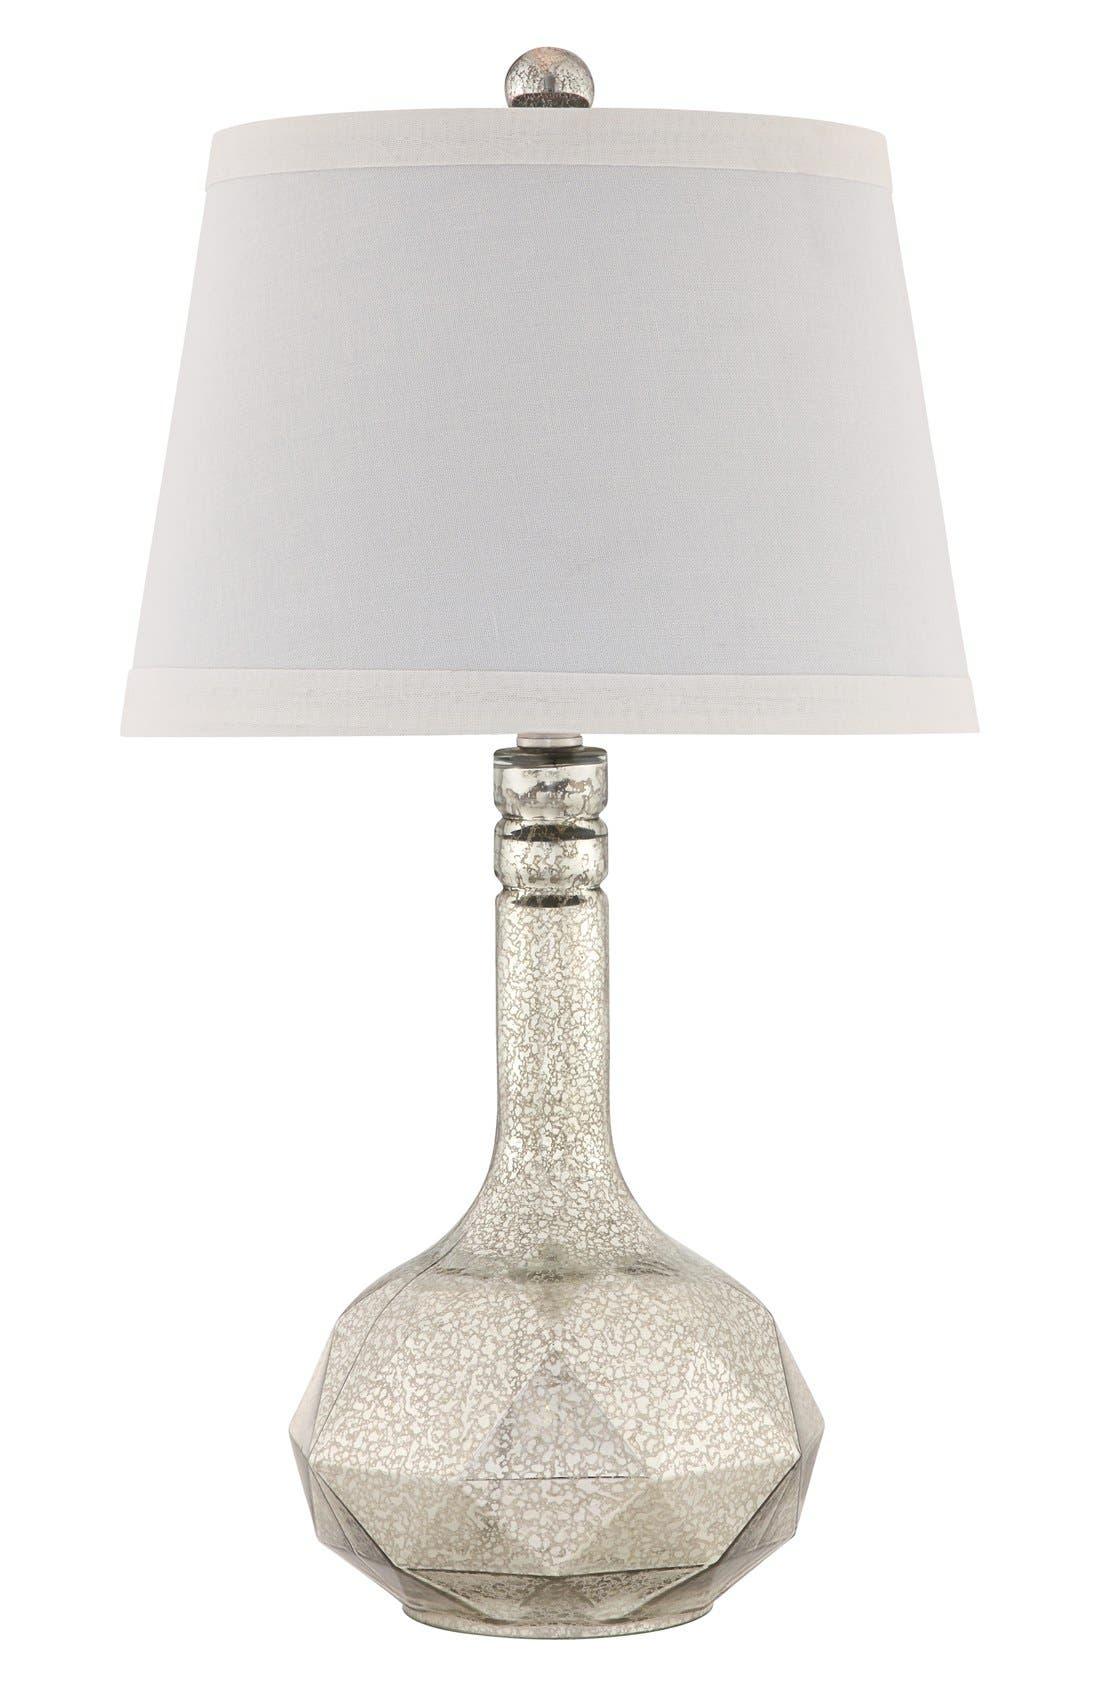 Alternate Image 1 Selected - JAlexander Lighting Mercury Glass Table Lamp